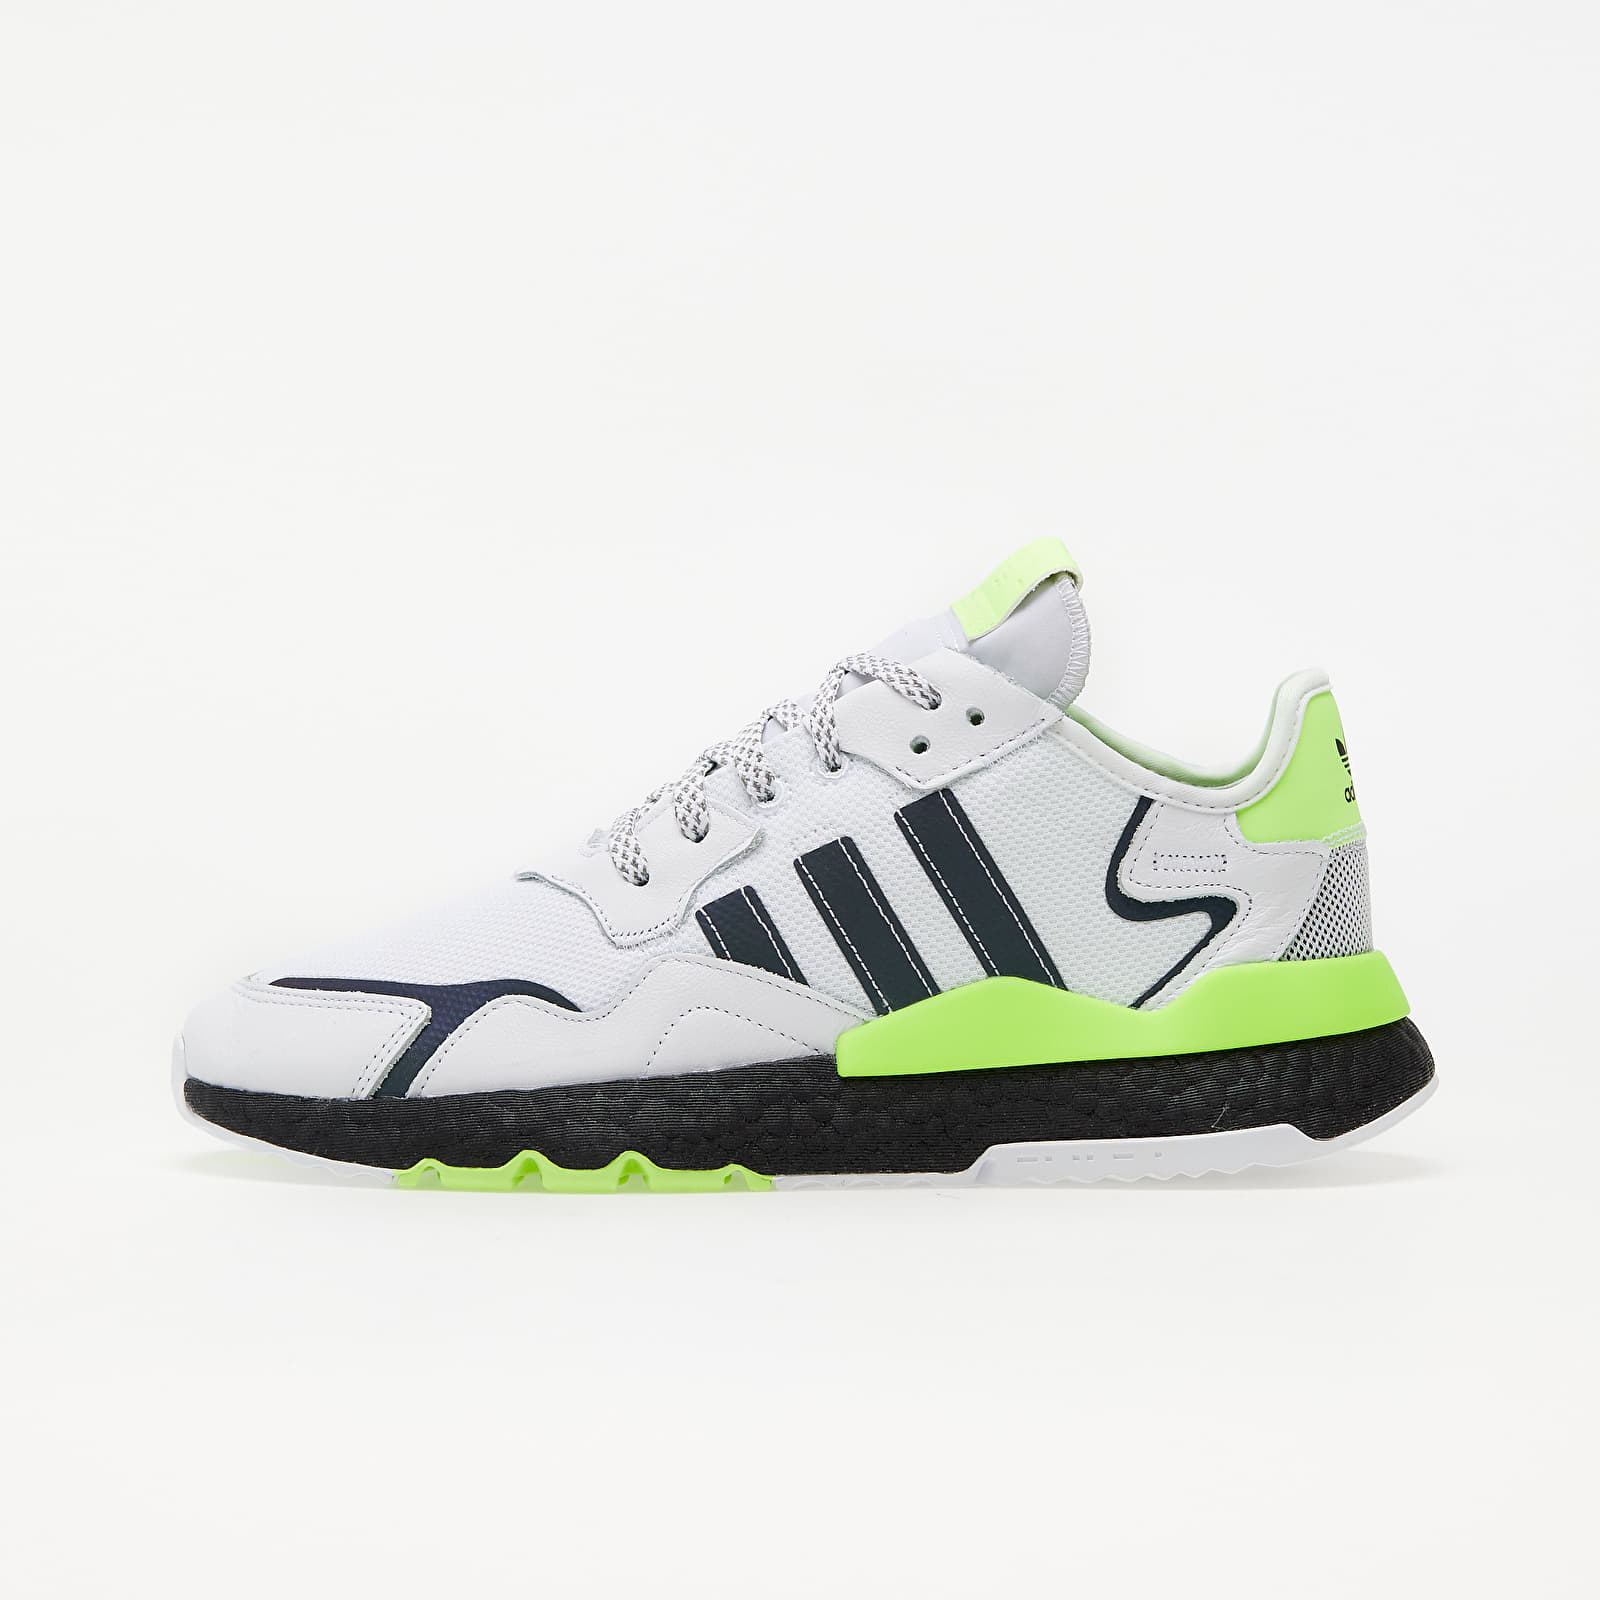 Men's shoes adidas Nite Jogger Ftw White/ Core Black/ Siggnr